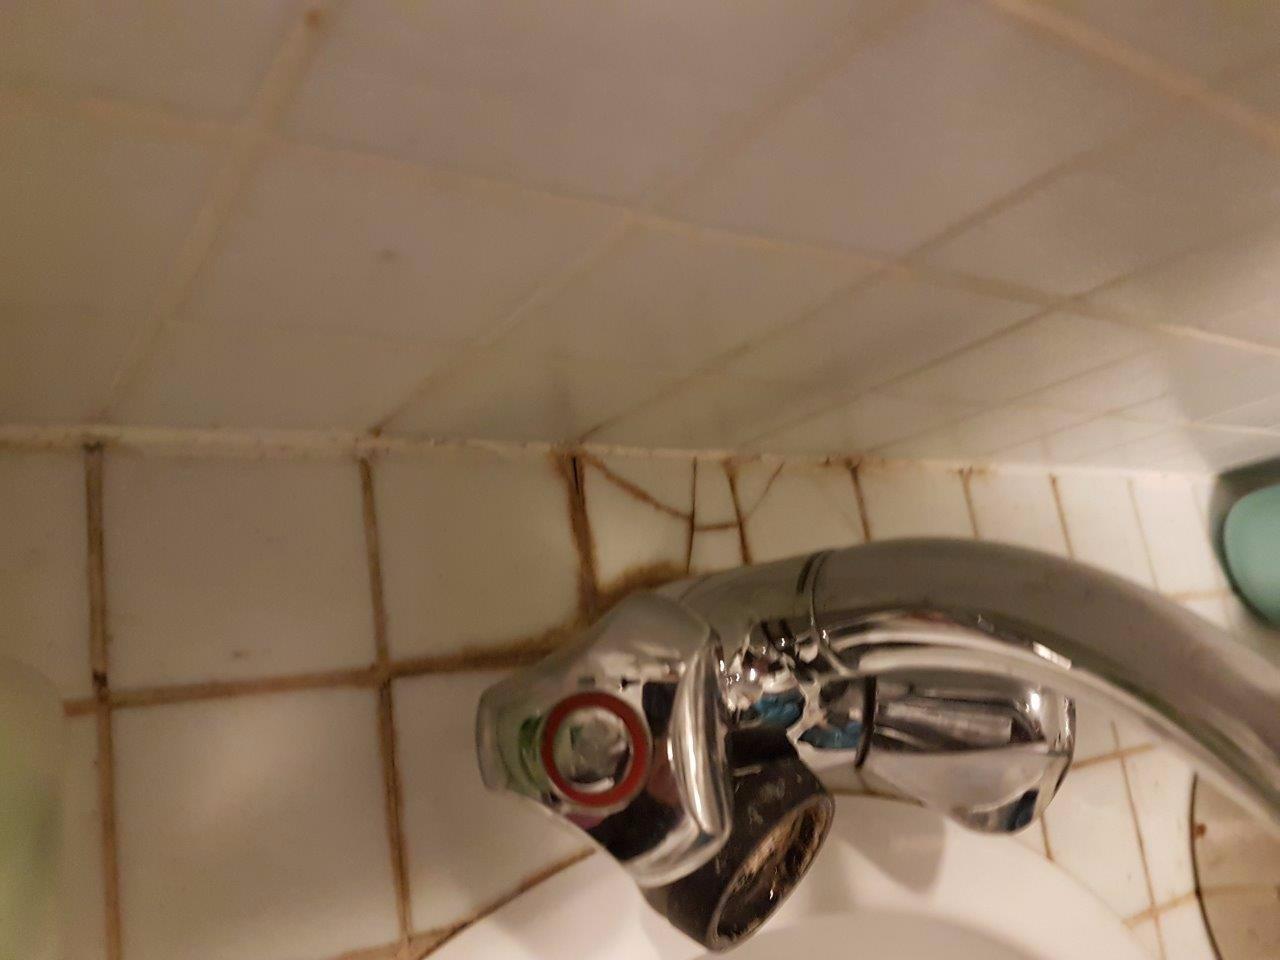 Waterdichte Coating Badkamer : Badkamer coaten epoxy coating badkamer new beautiful open